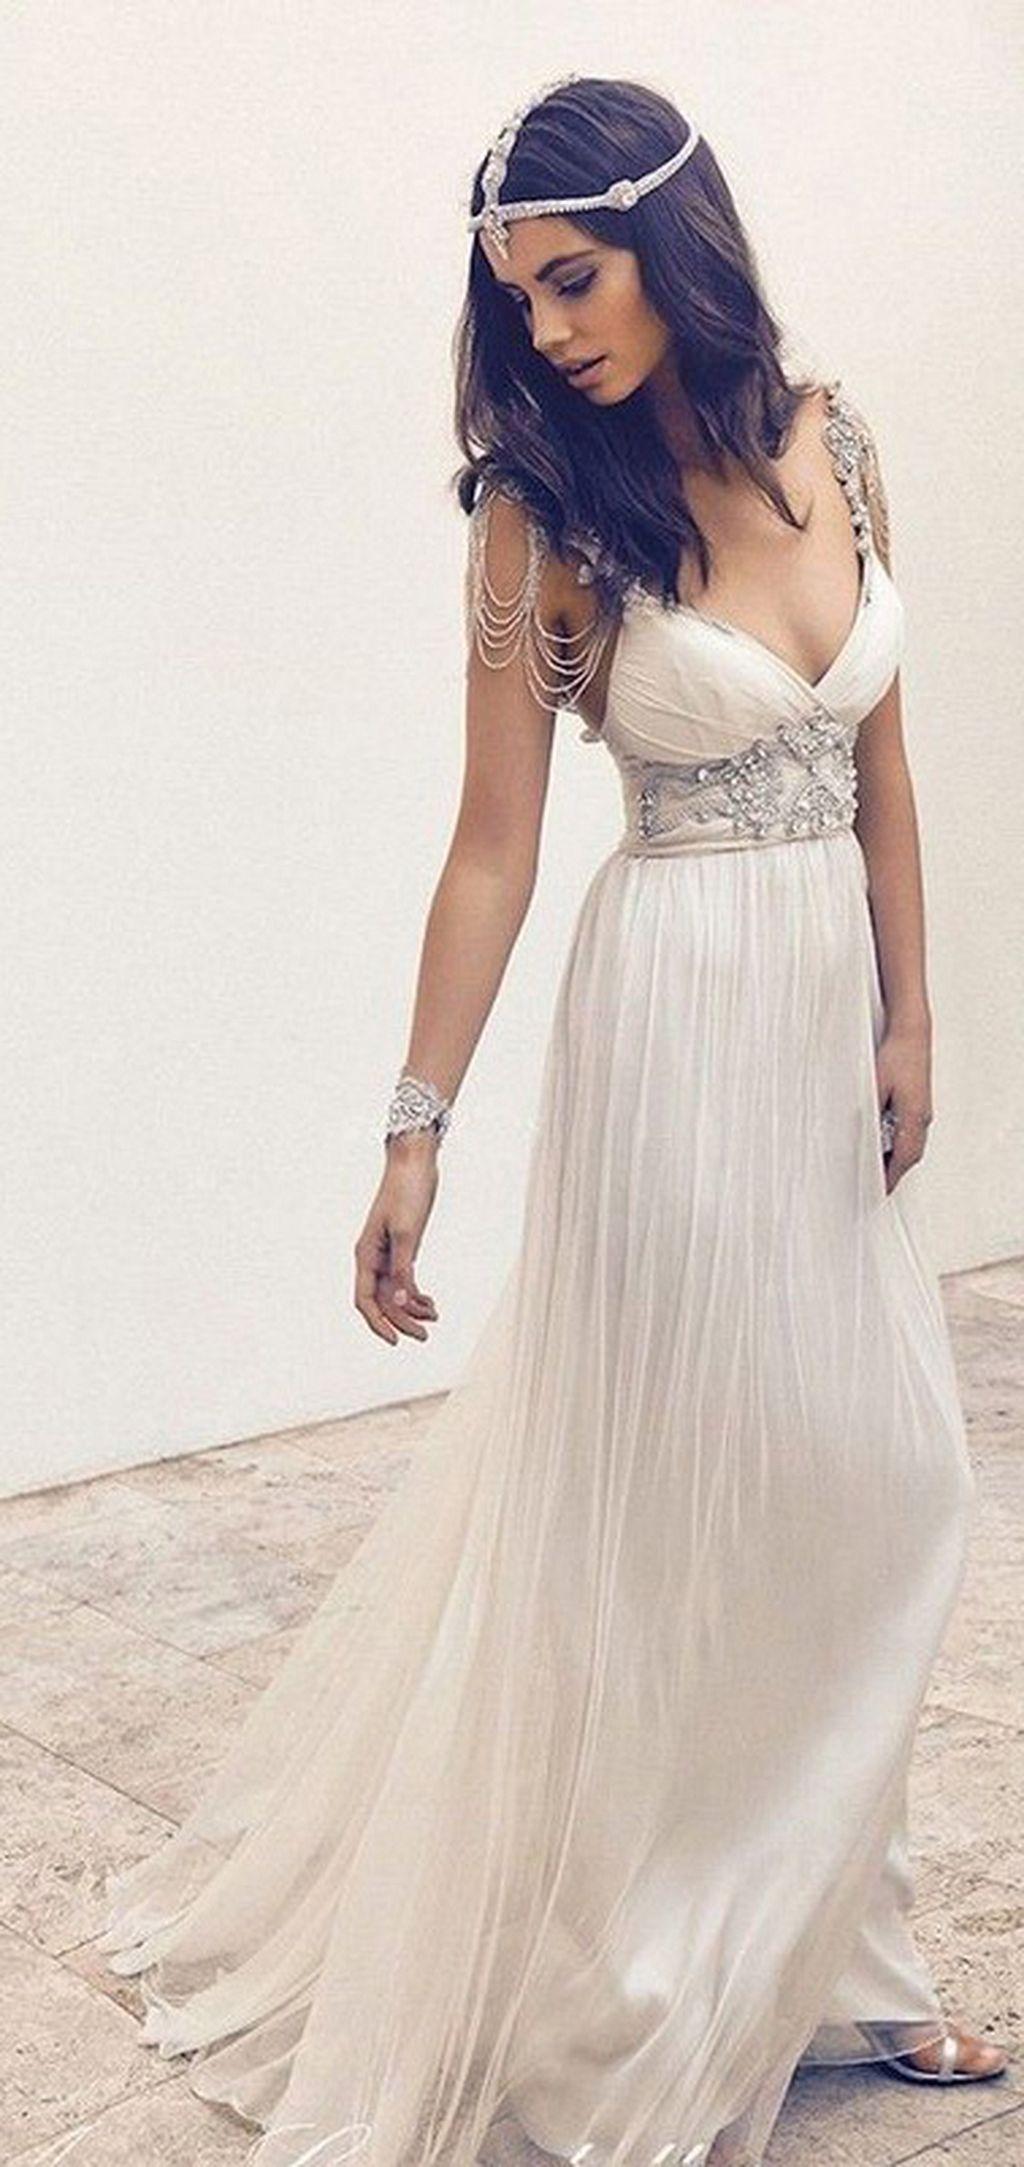 Awesome vintage wedding dress ideas weddmagz